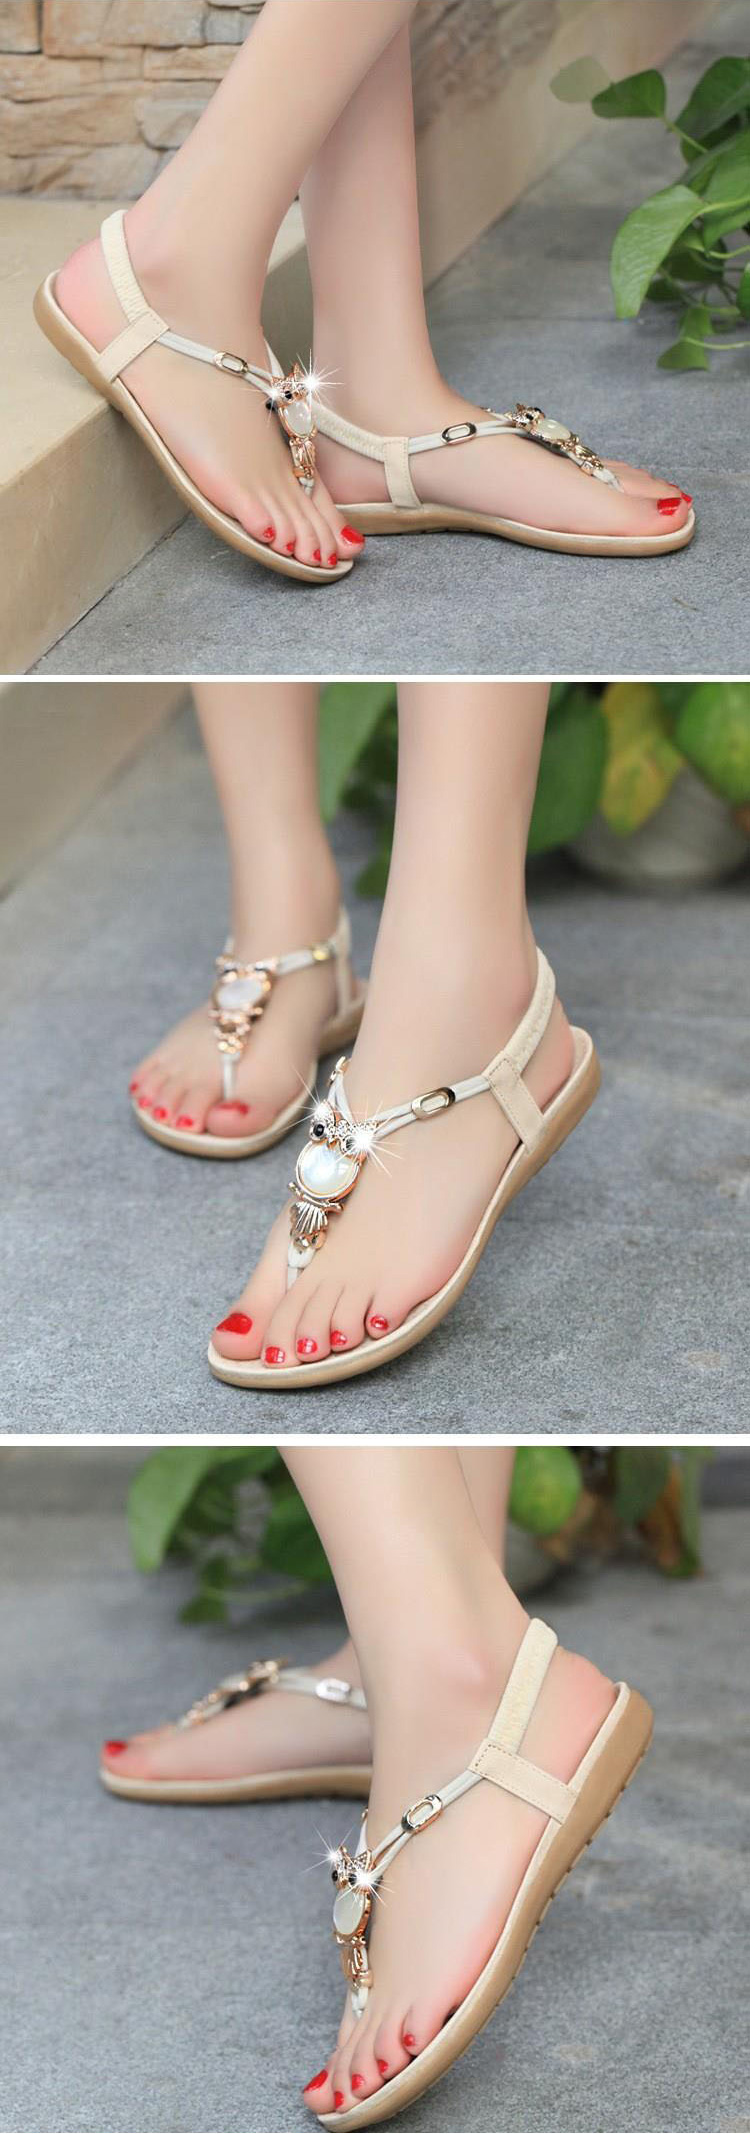 HTB1RDphkNTI8KJjSspiq6zM4FXaj Women shoes 2019 hot fashion women sandals elastic t-strap bohemia beaded owl slipper flat sandals women summer shoes flip flop